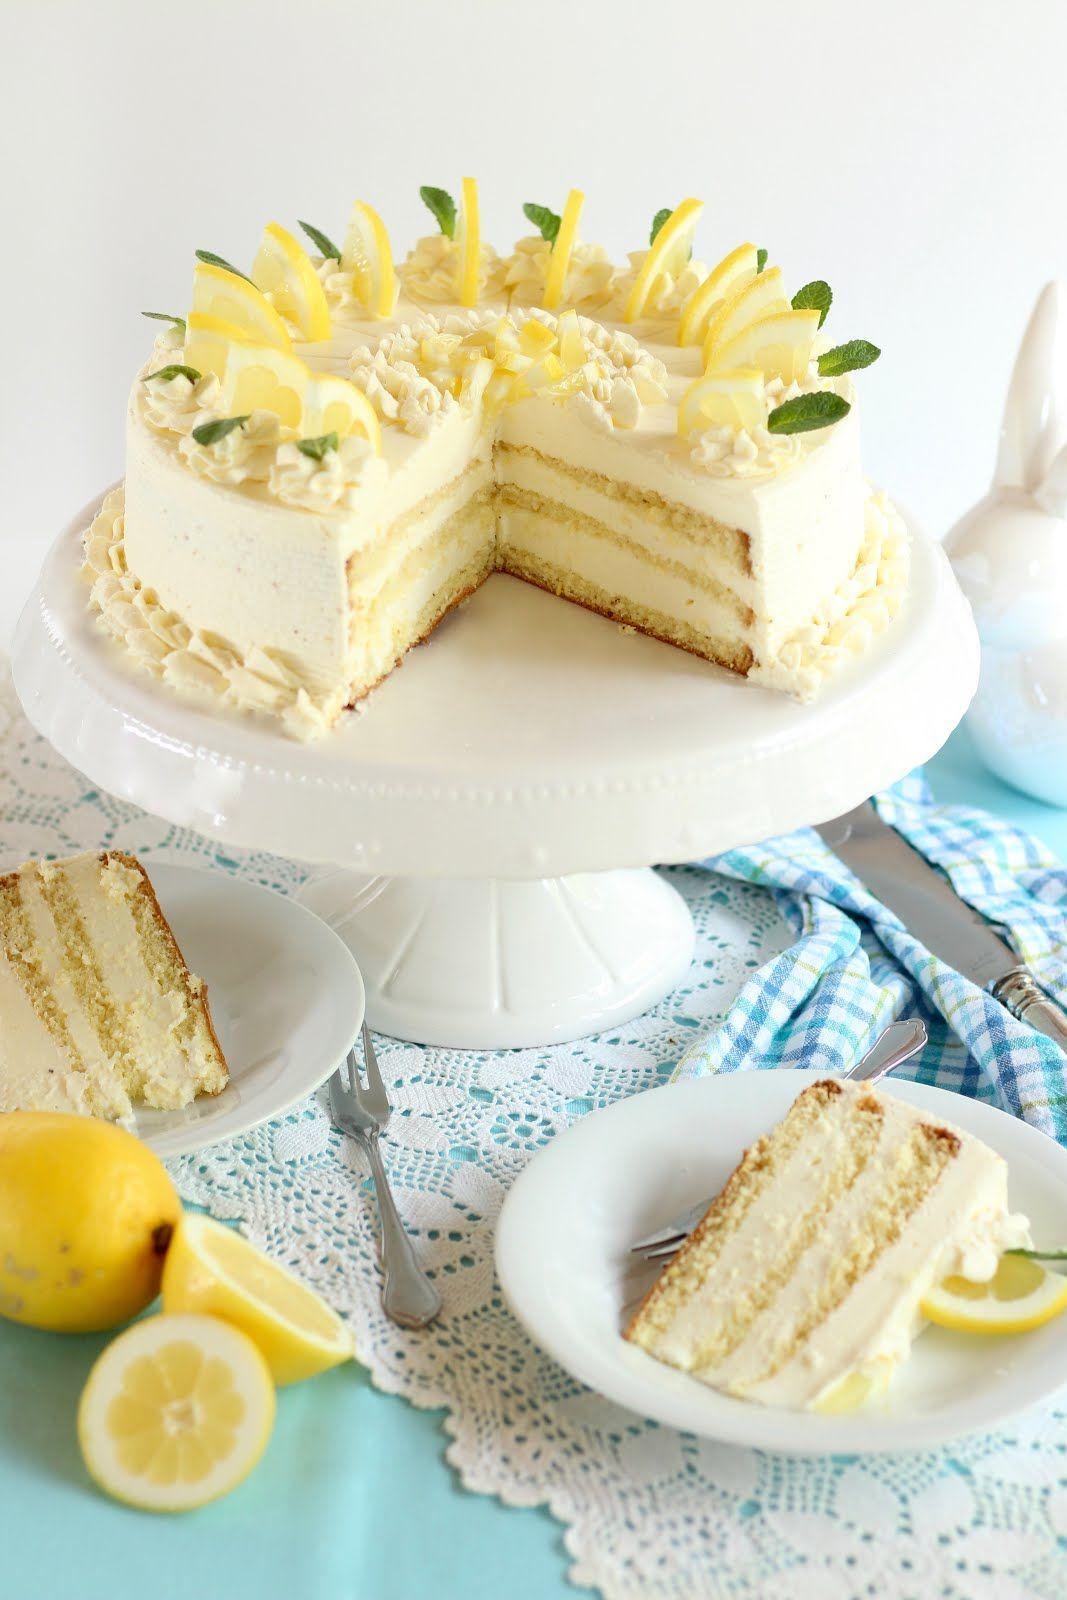 Lemon Tart With Delicious Buttermilk And Lemon Cream Lemon Cream Buttermilk Cream Delicious Lemon Tart In 2020 Easter Recipes Delicious Lemon Tart